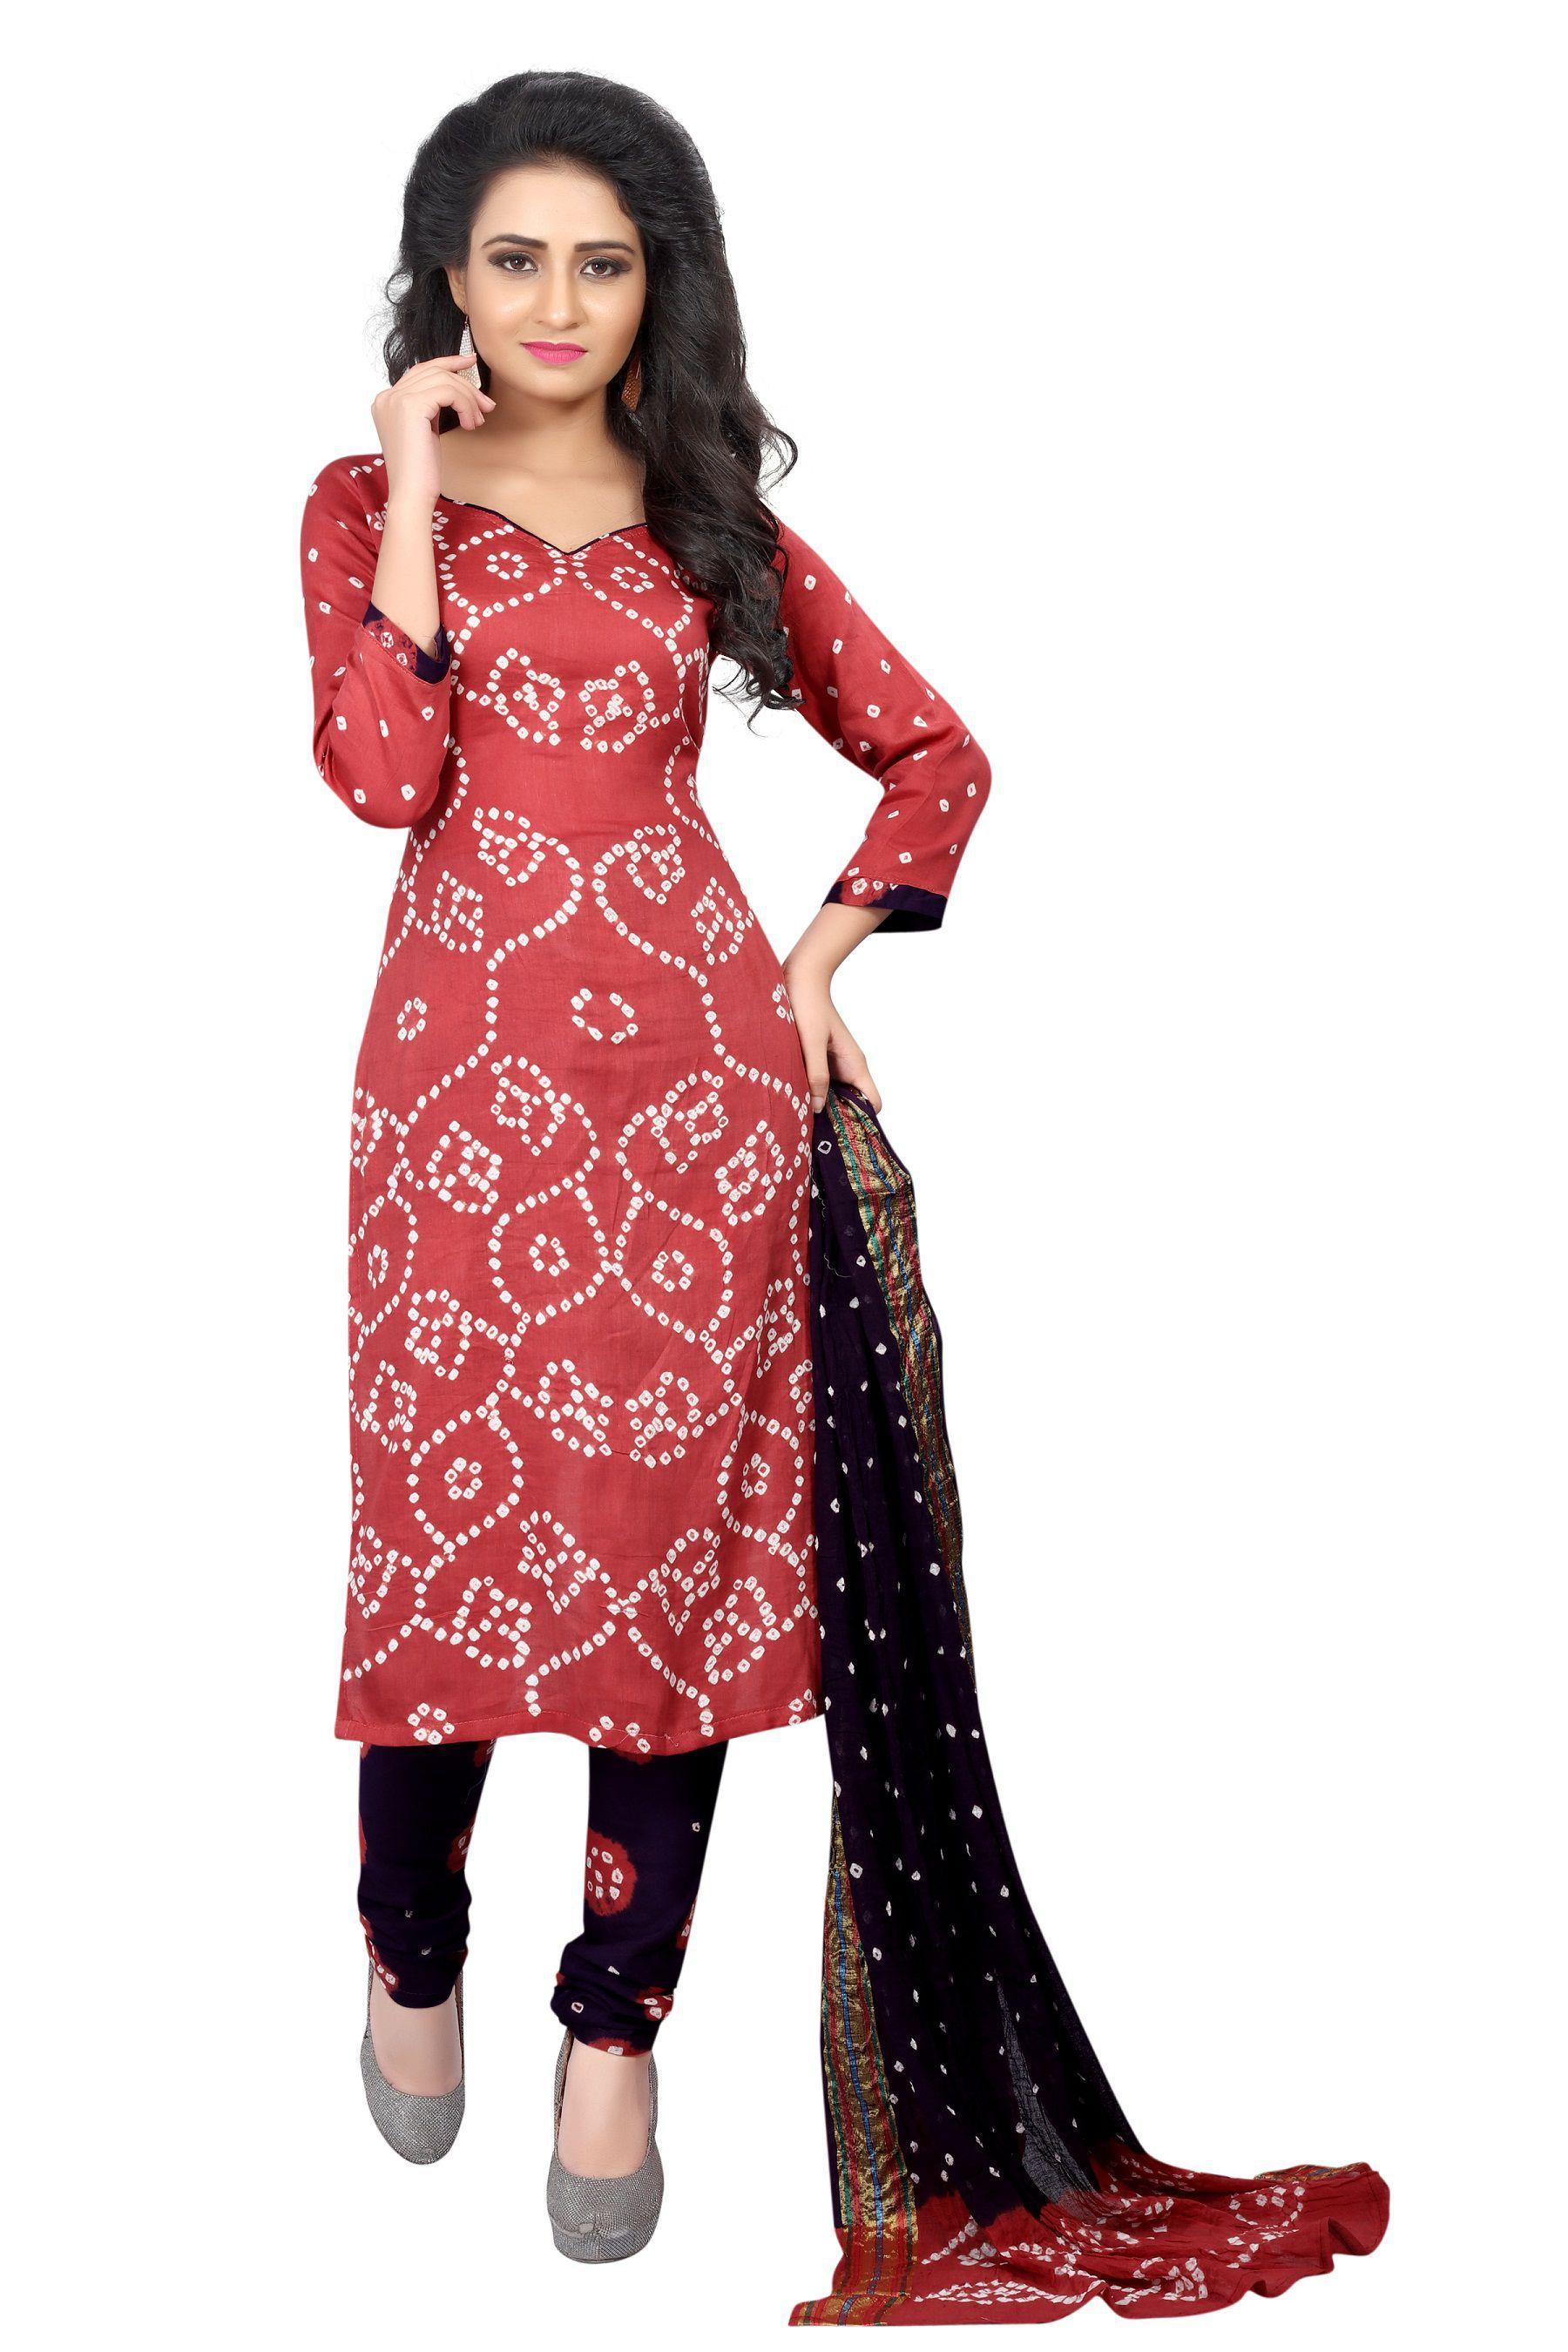 Wedding Villa Red and Black Satin Dress Material